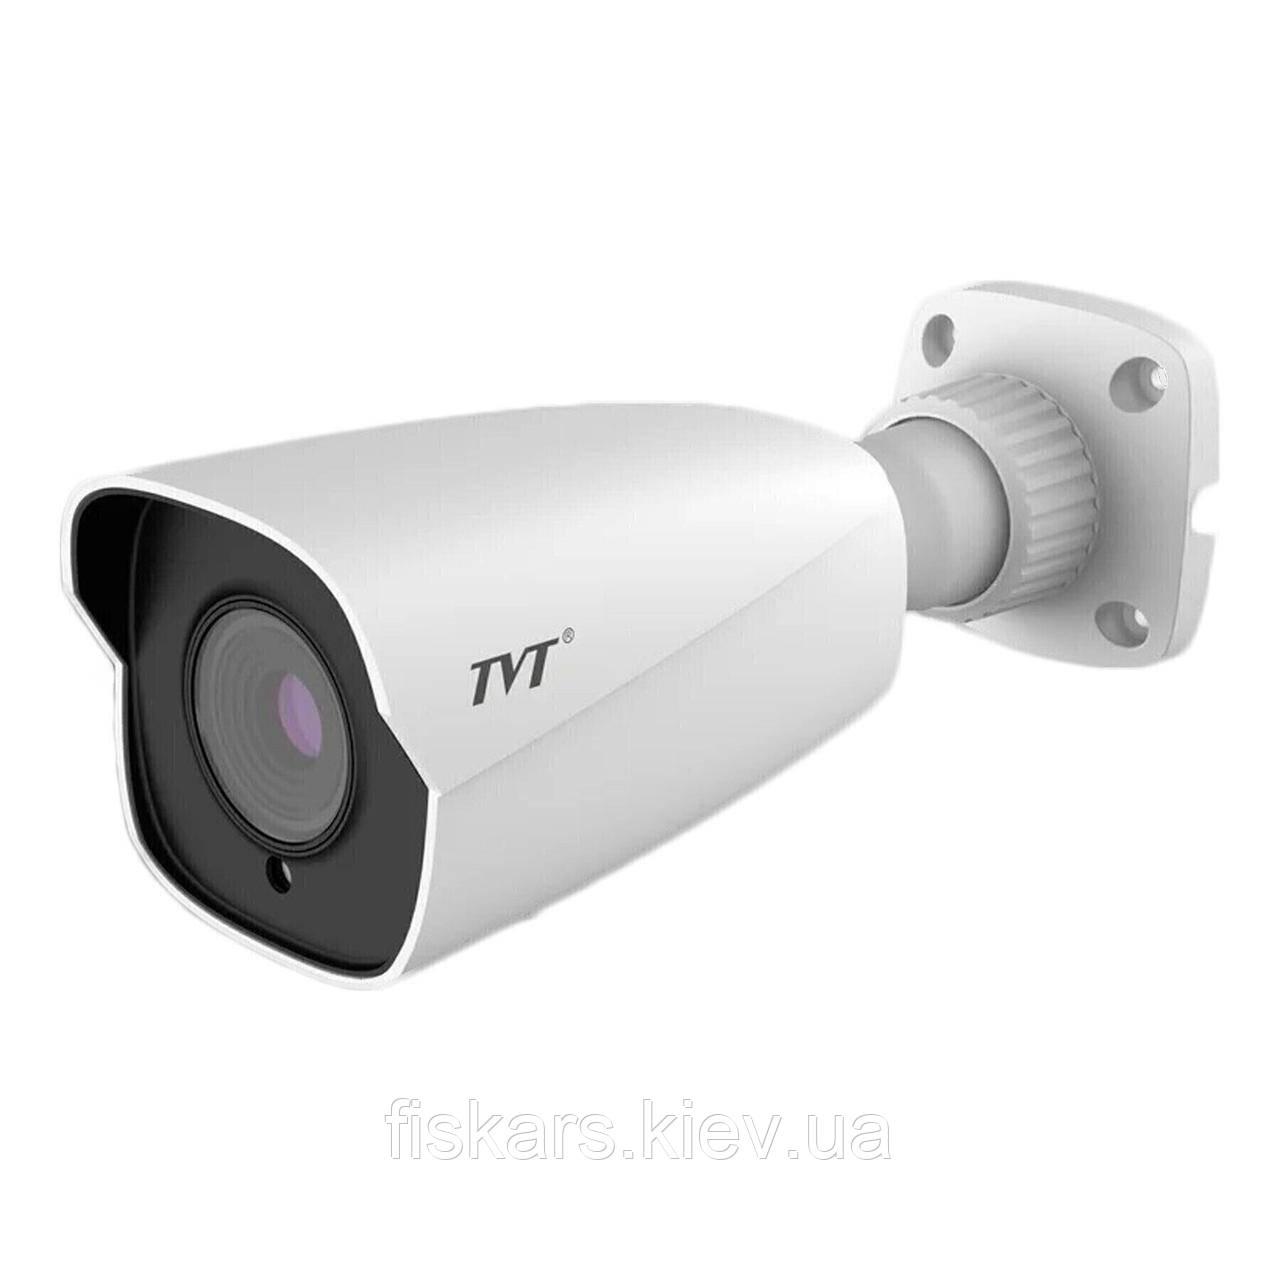 2 Мп IP-камера с видеоаналитикой TVT Digital TD-9422E3 (D/AZ/PE/AR3)